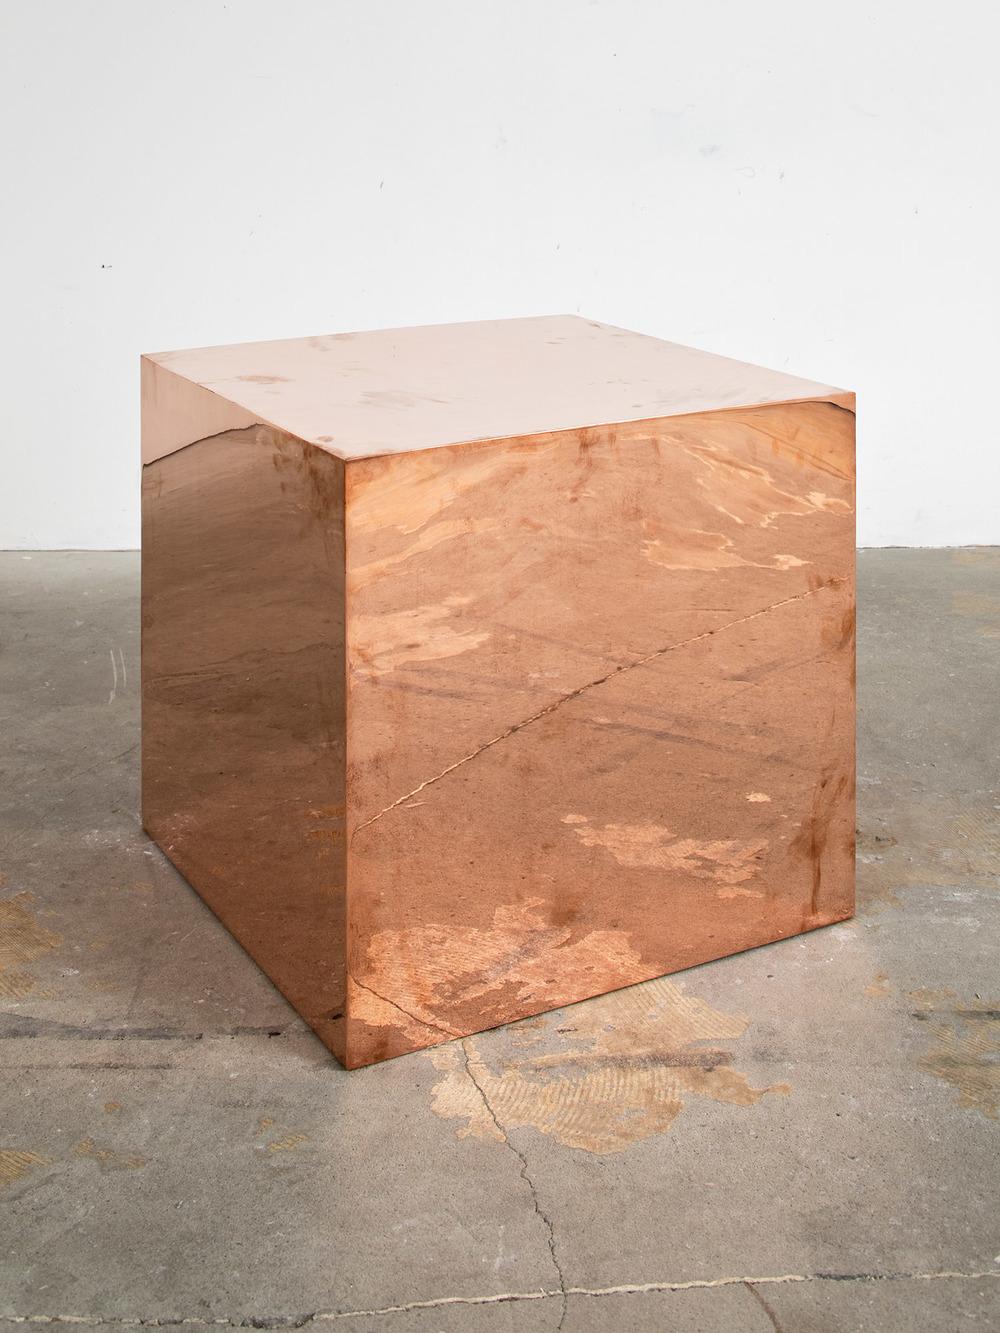 24-inch Copper (FedEx Large Kraft Box 2008 FEDEX 330510 REV 6/08 GP), International Priority, Los Angeles–Malmö trk#794379965566, February 2–4, 2011, International Priority, Malmö–Mostolés trk#871976834313, June 10–13, 2011, International Priority, Mostolés–Los Angeles trk#797697675646, November 3–8, 2011    2011–   Polished copper, accrued FedEx shipping, and tracking labels  24 x 24 x 24 inches   FedEx Copper Works, 2009–